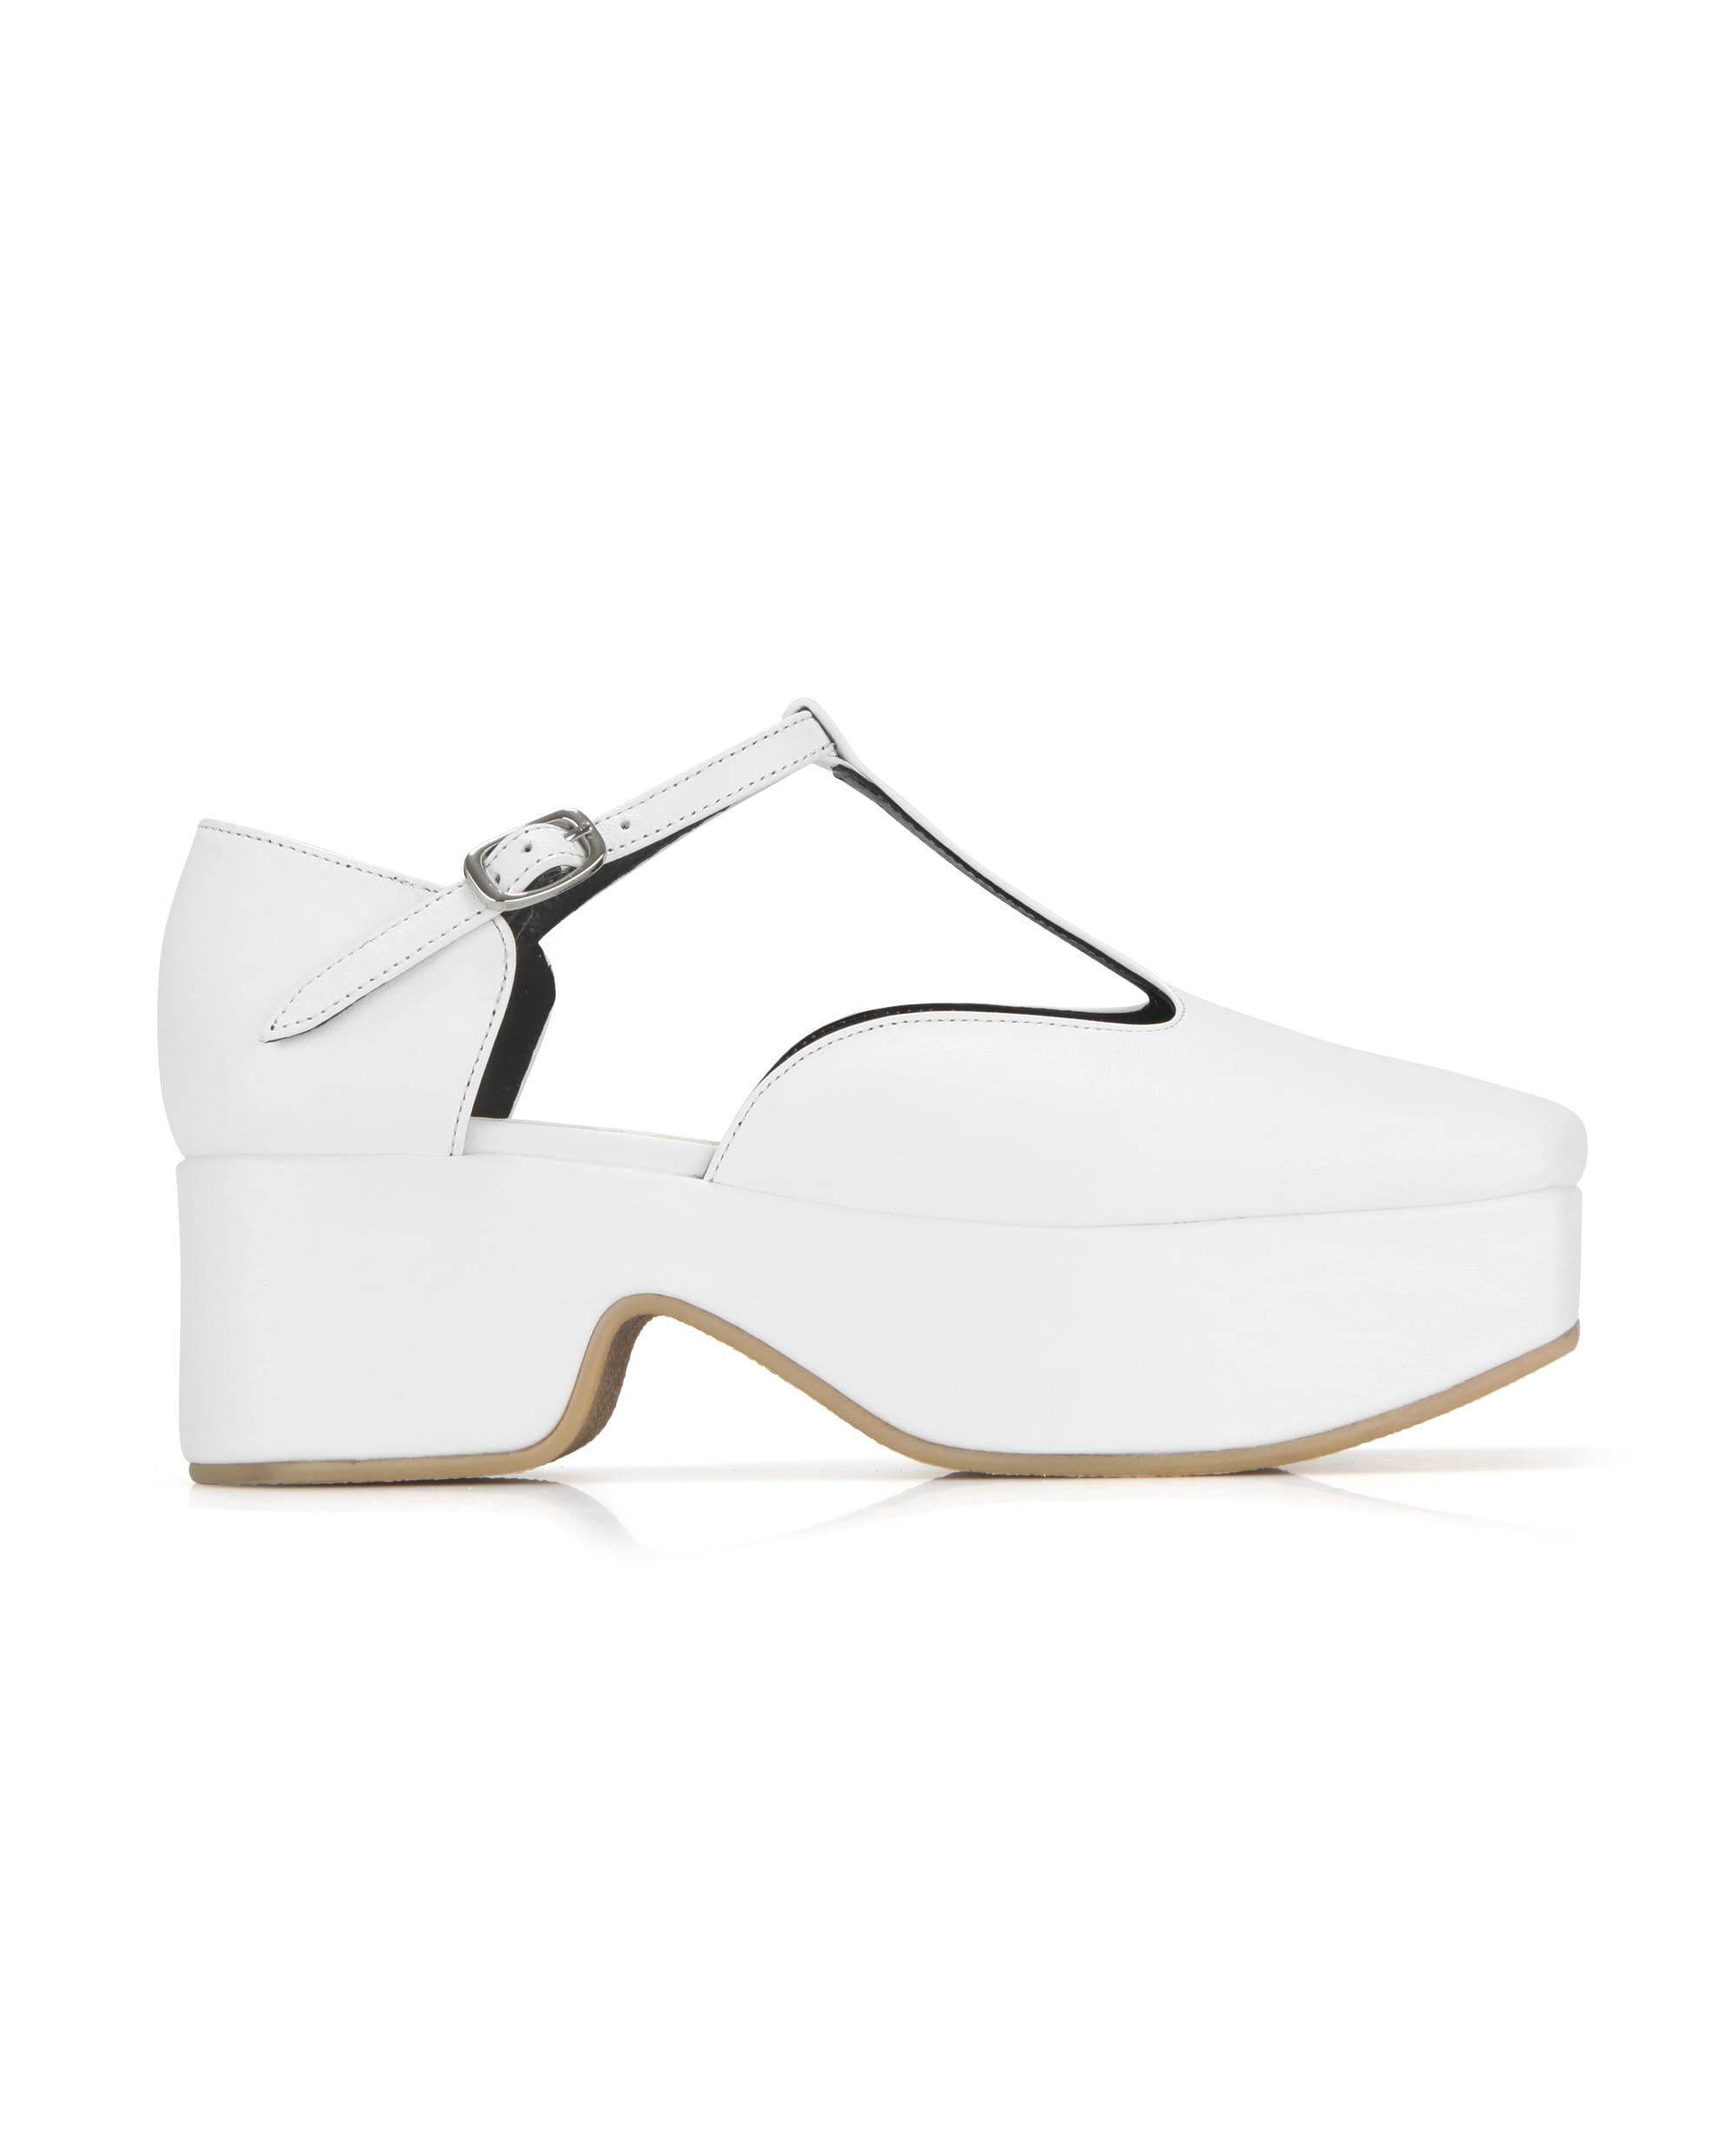 Squared toe T-strap mary jane platforms | White